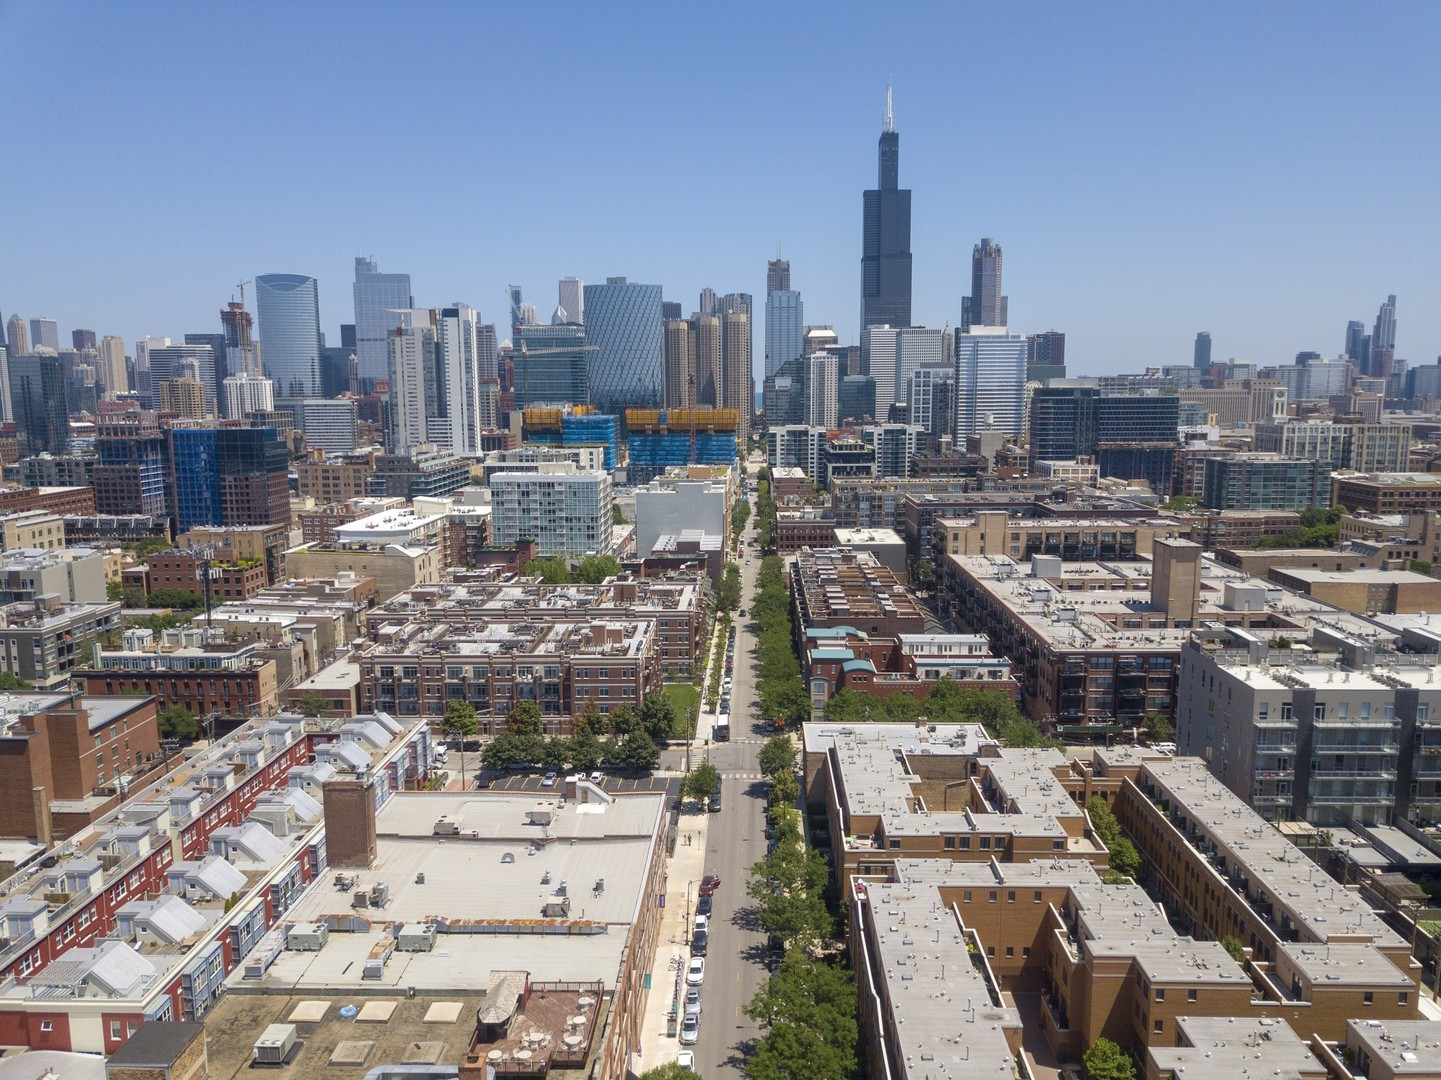 1137 Monroe Unit Unit 6 ,Chicago, Illinois 60607